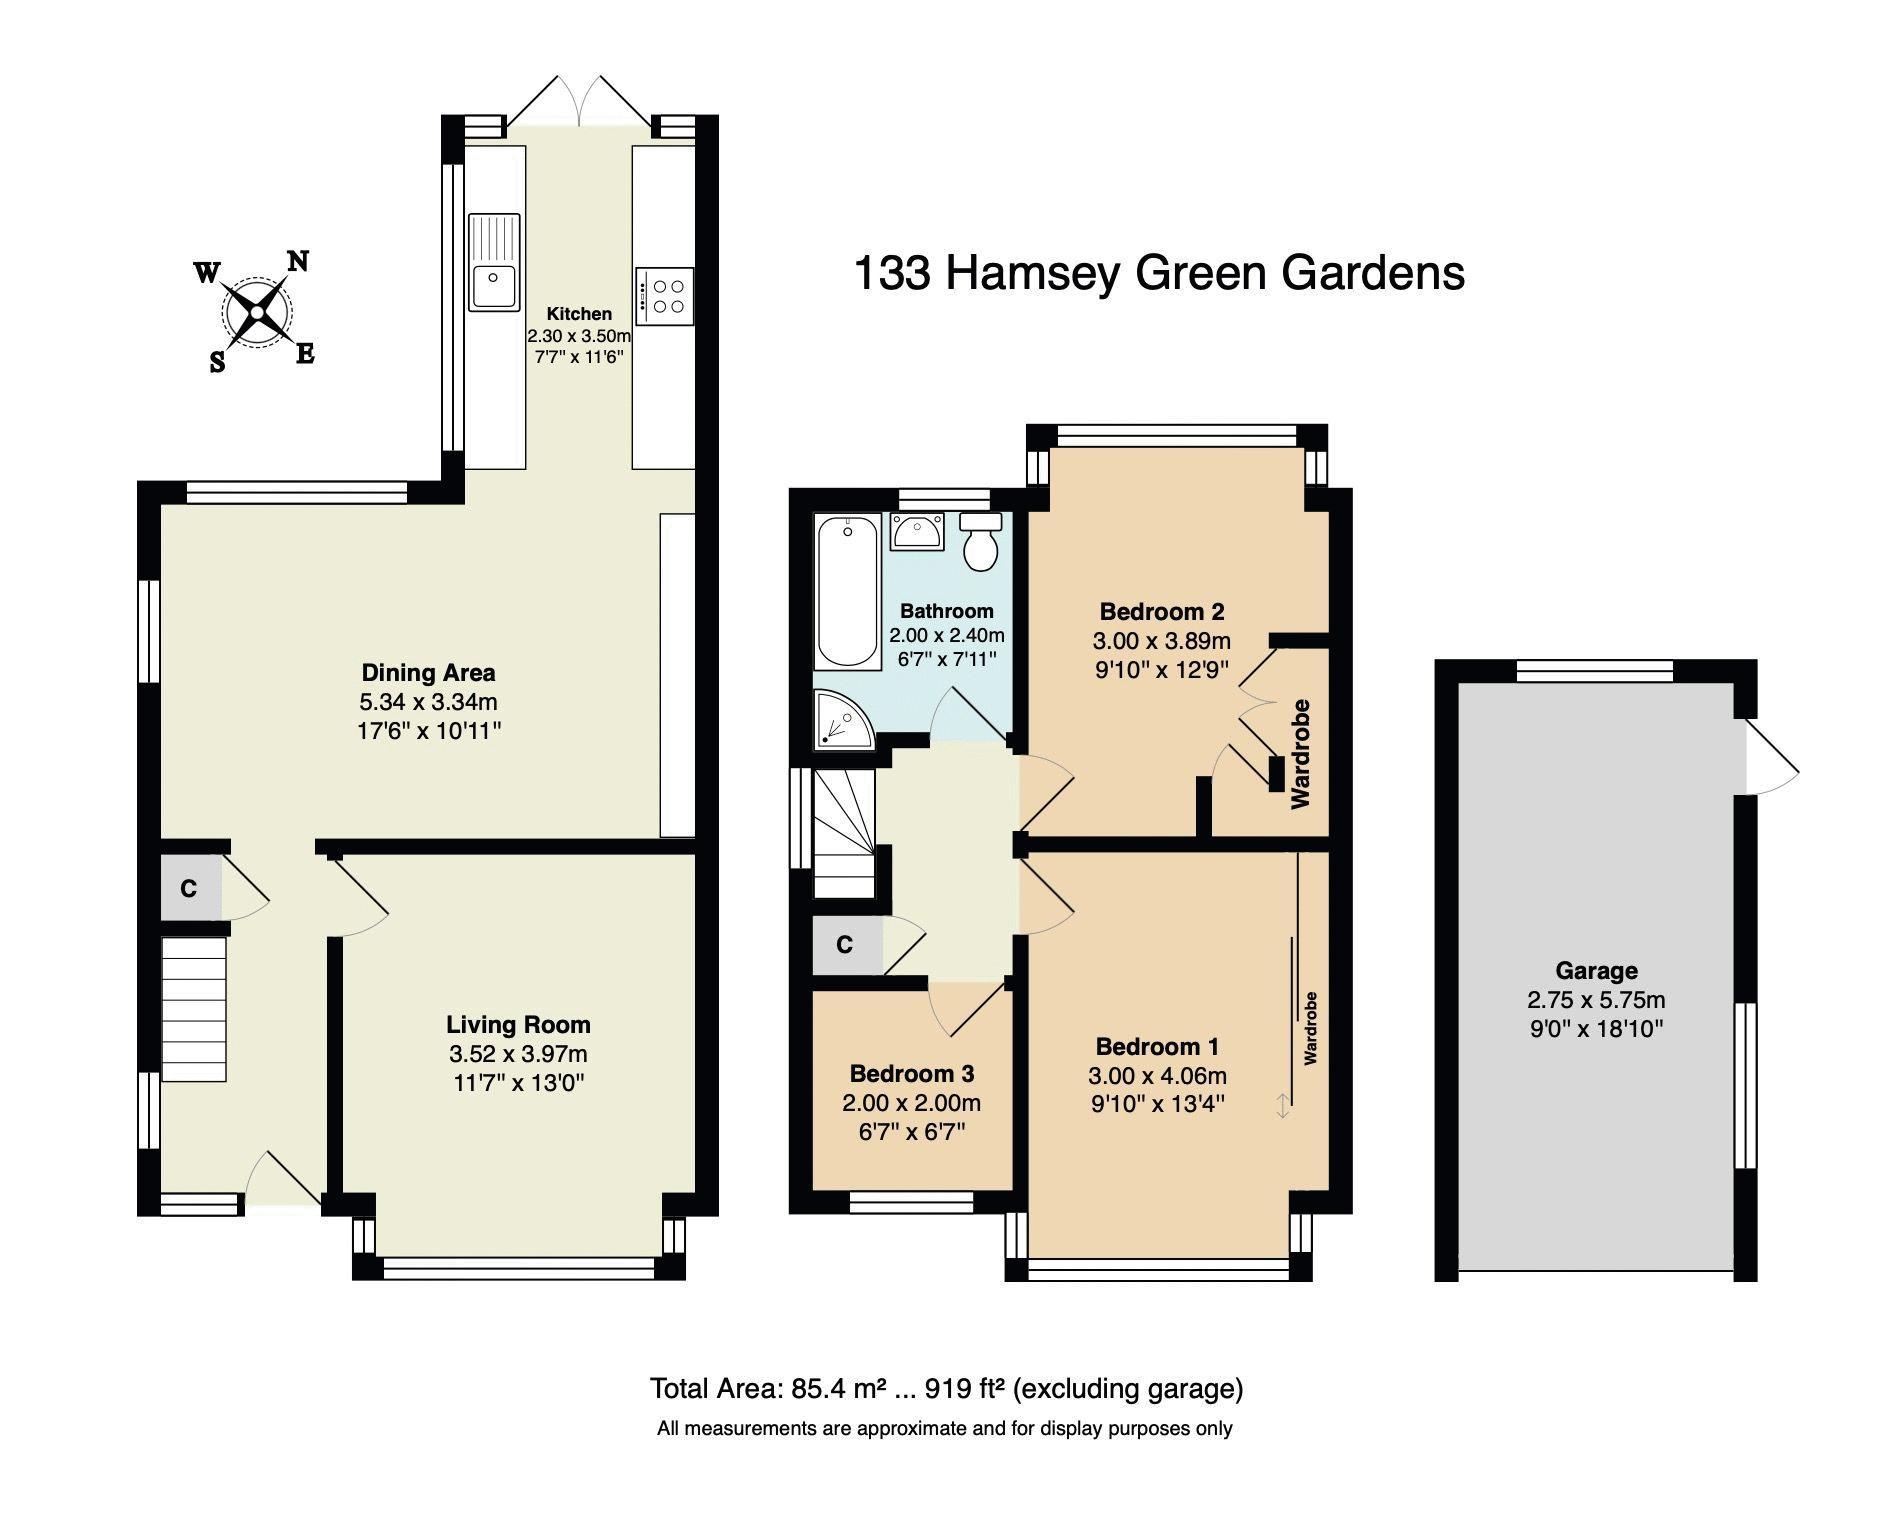 Hamsey Green Gardens